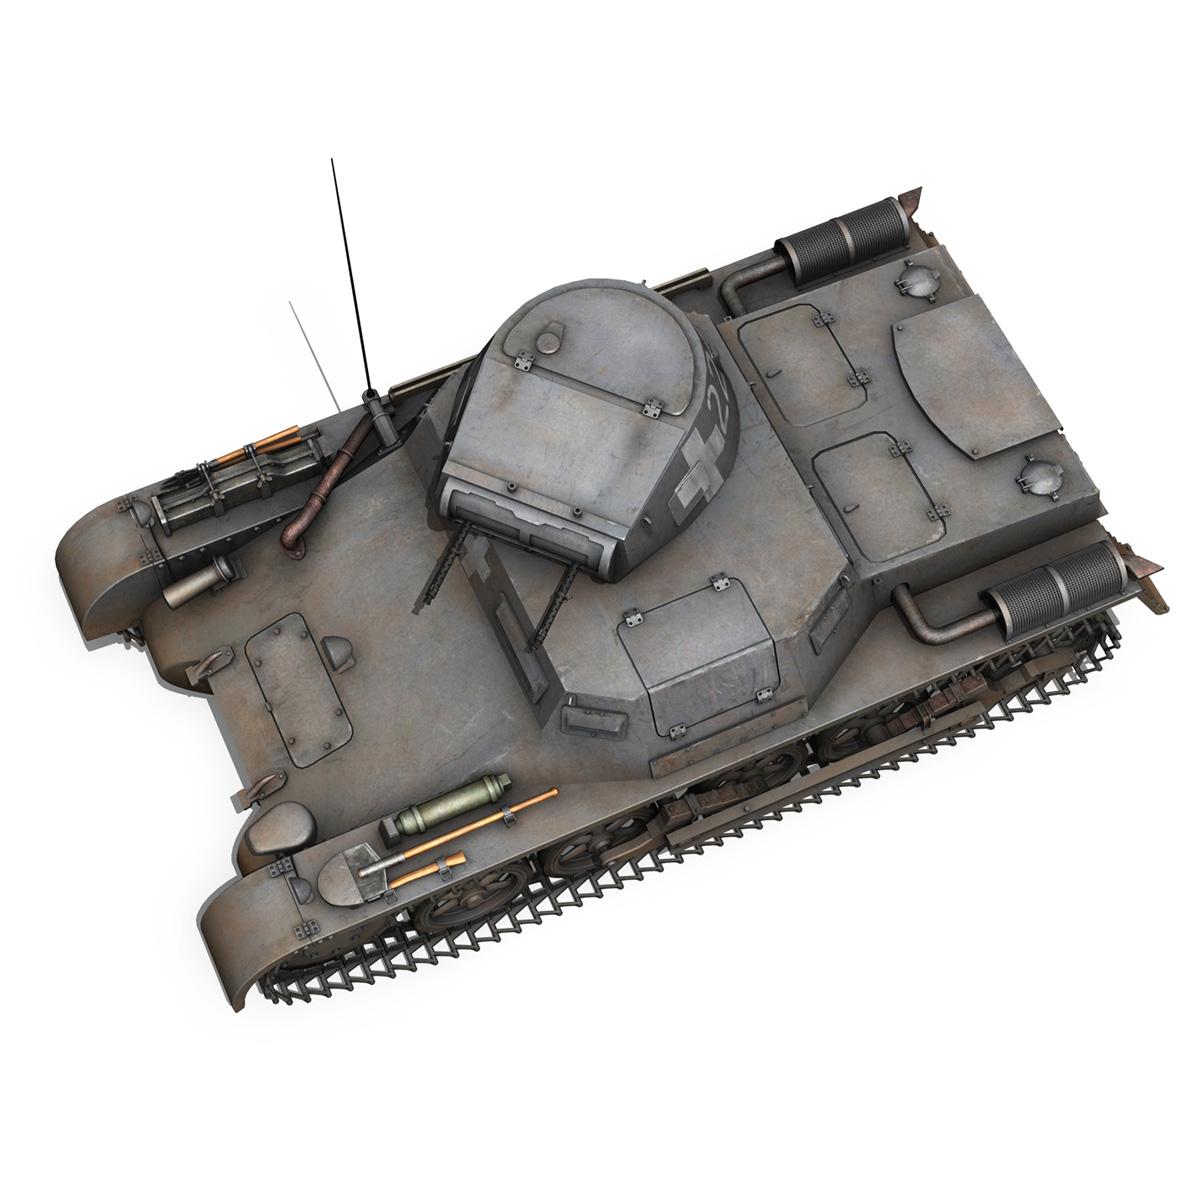 pzkpfw 1 - Panzer 1 - ausf. a - 22 3d modell 3ds fbx c4d lwo obj 186933